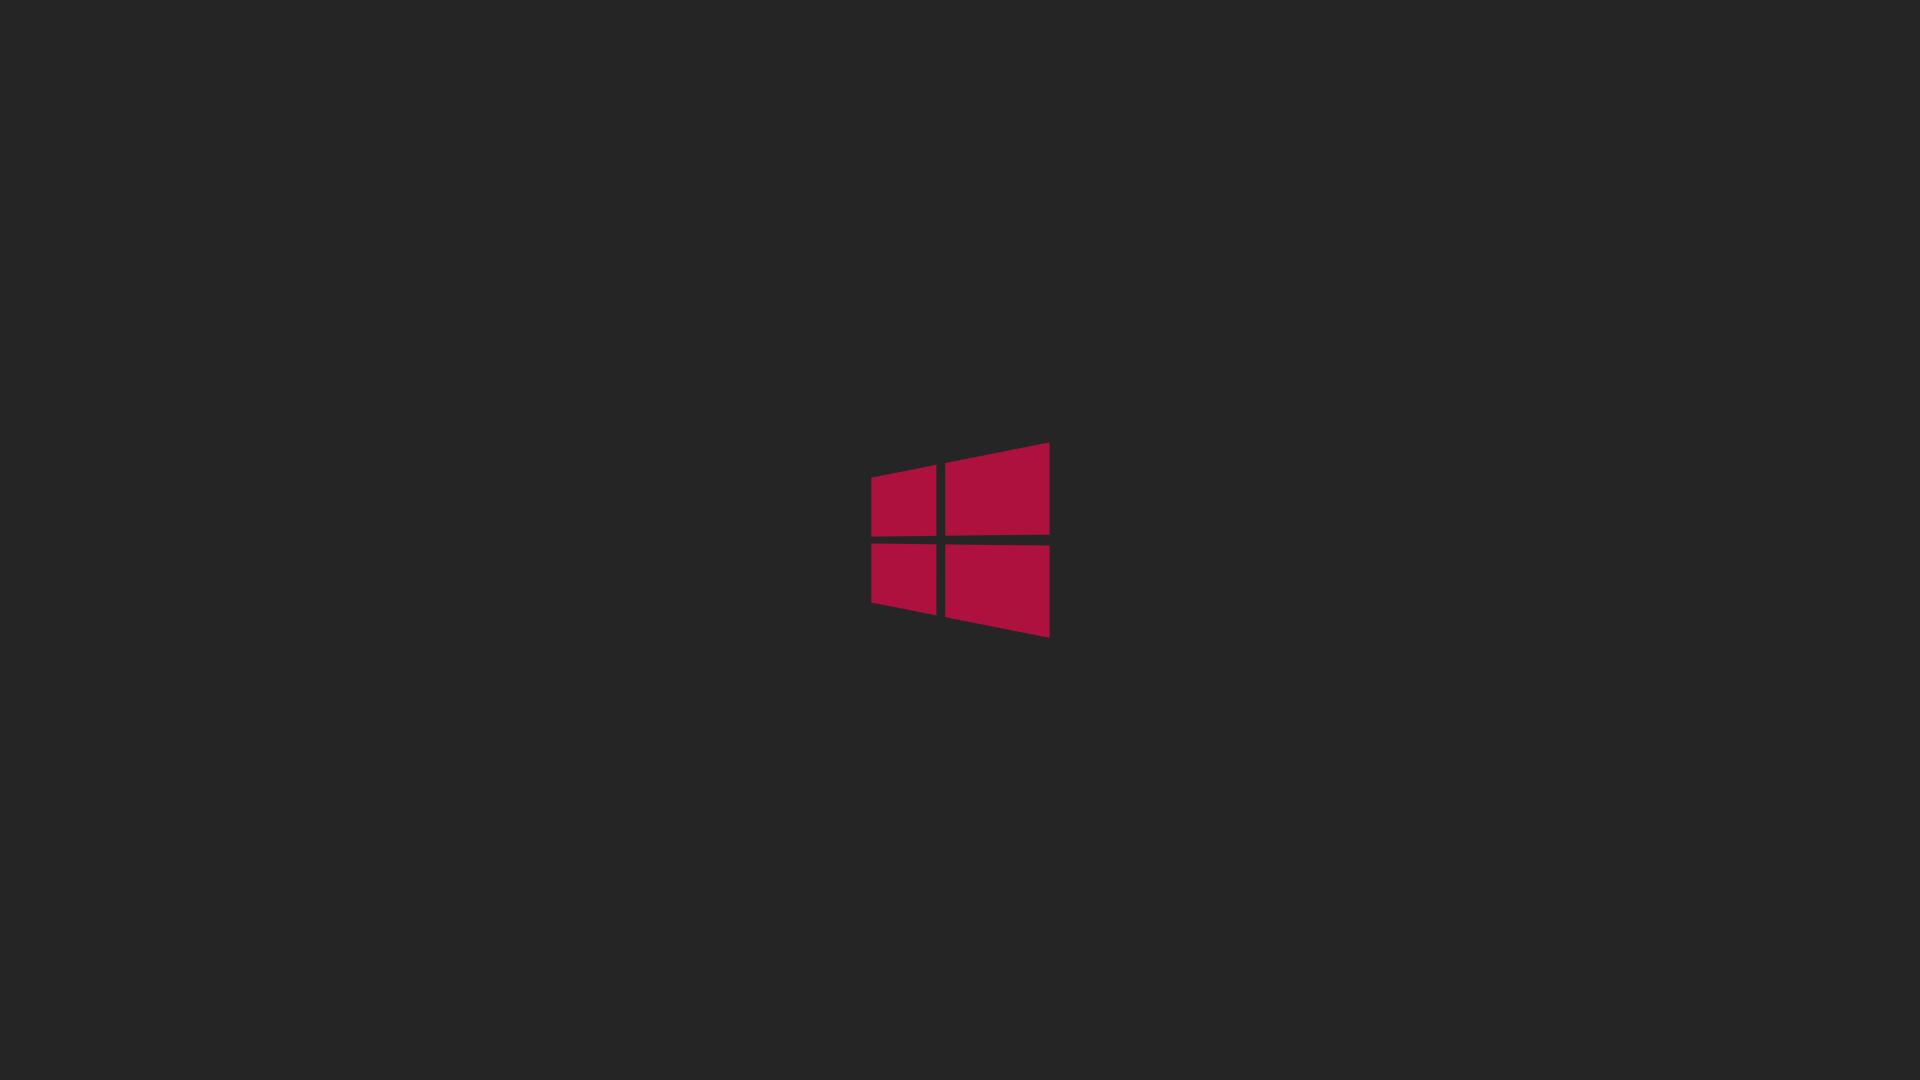 windows 8 wallpaper 48611